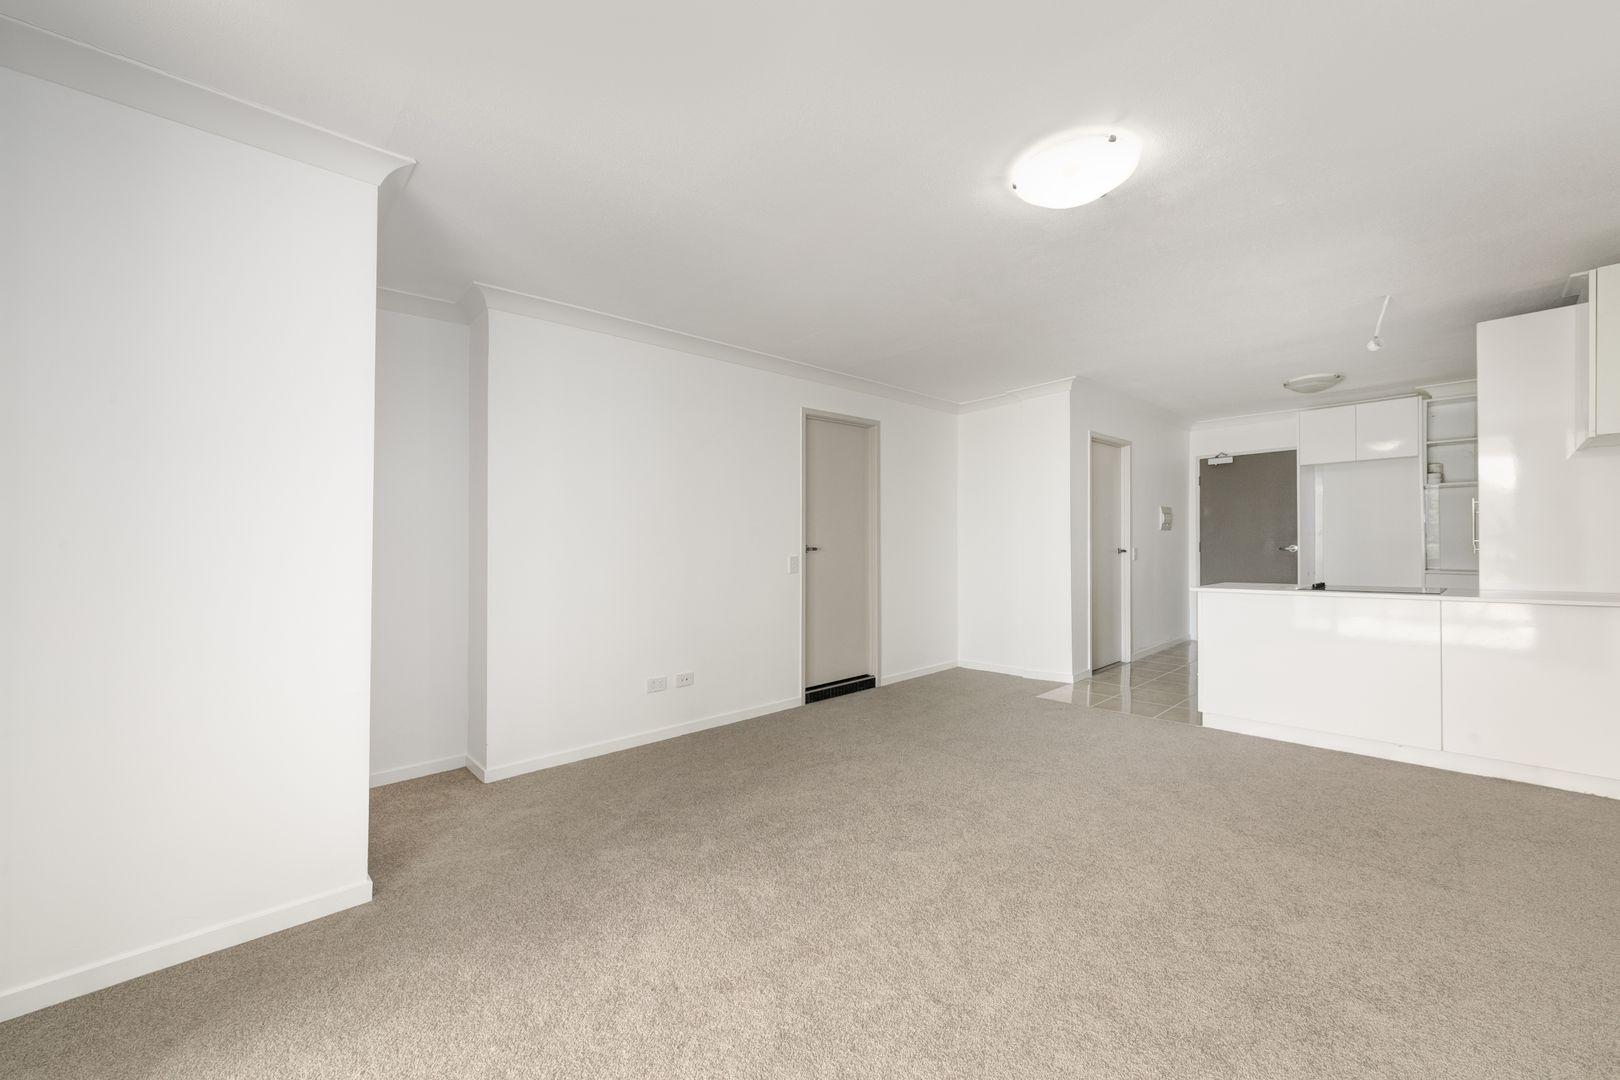 44 Mascar Street, Upper Mount Gravatt QLD 4122, Image 0